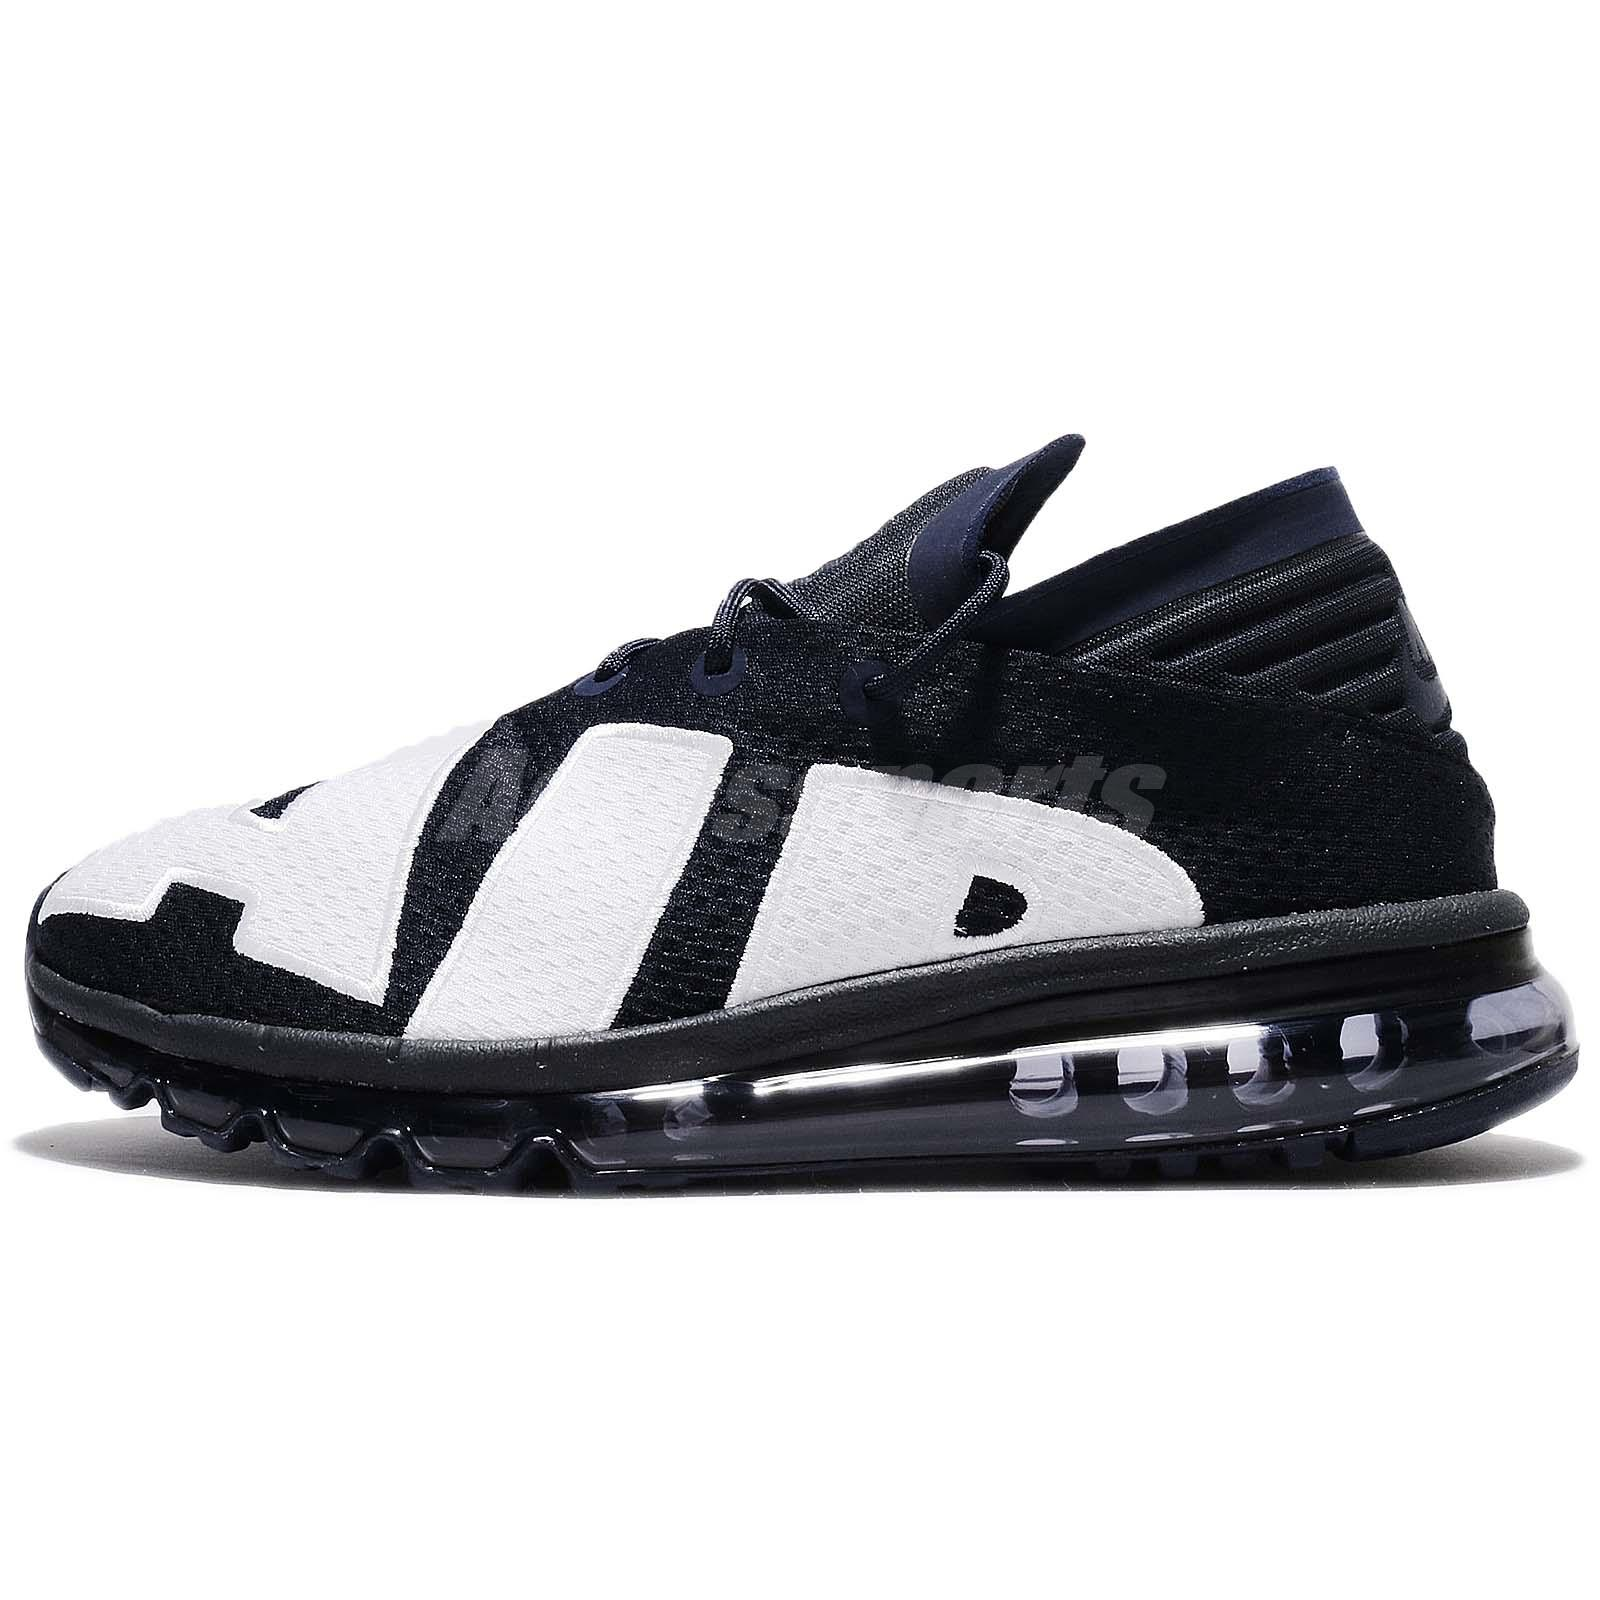 0eeb94098998 Nike Air Max Flair Dark Obsidian White Men Running Shoes Sneakers 942236-400